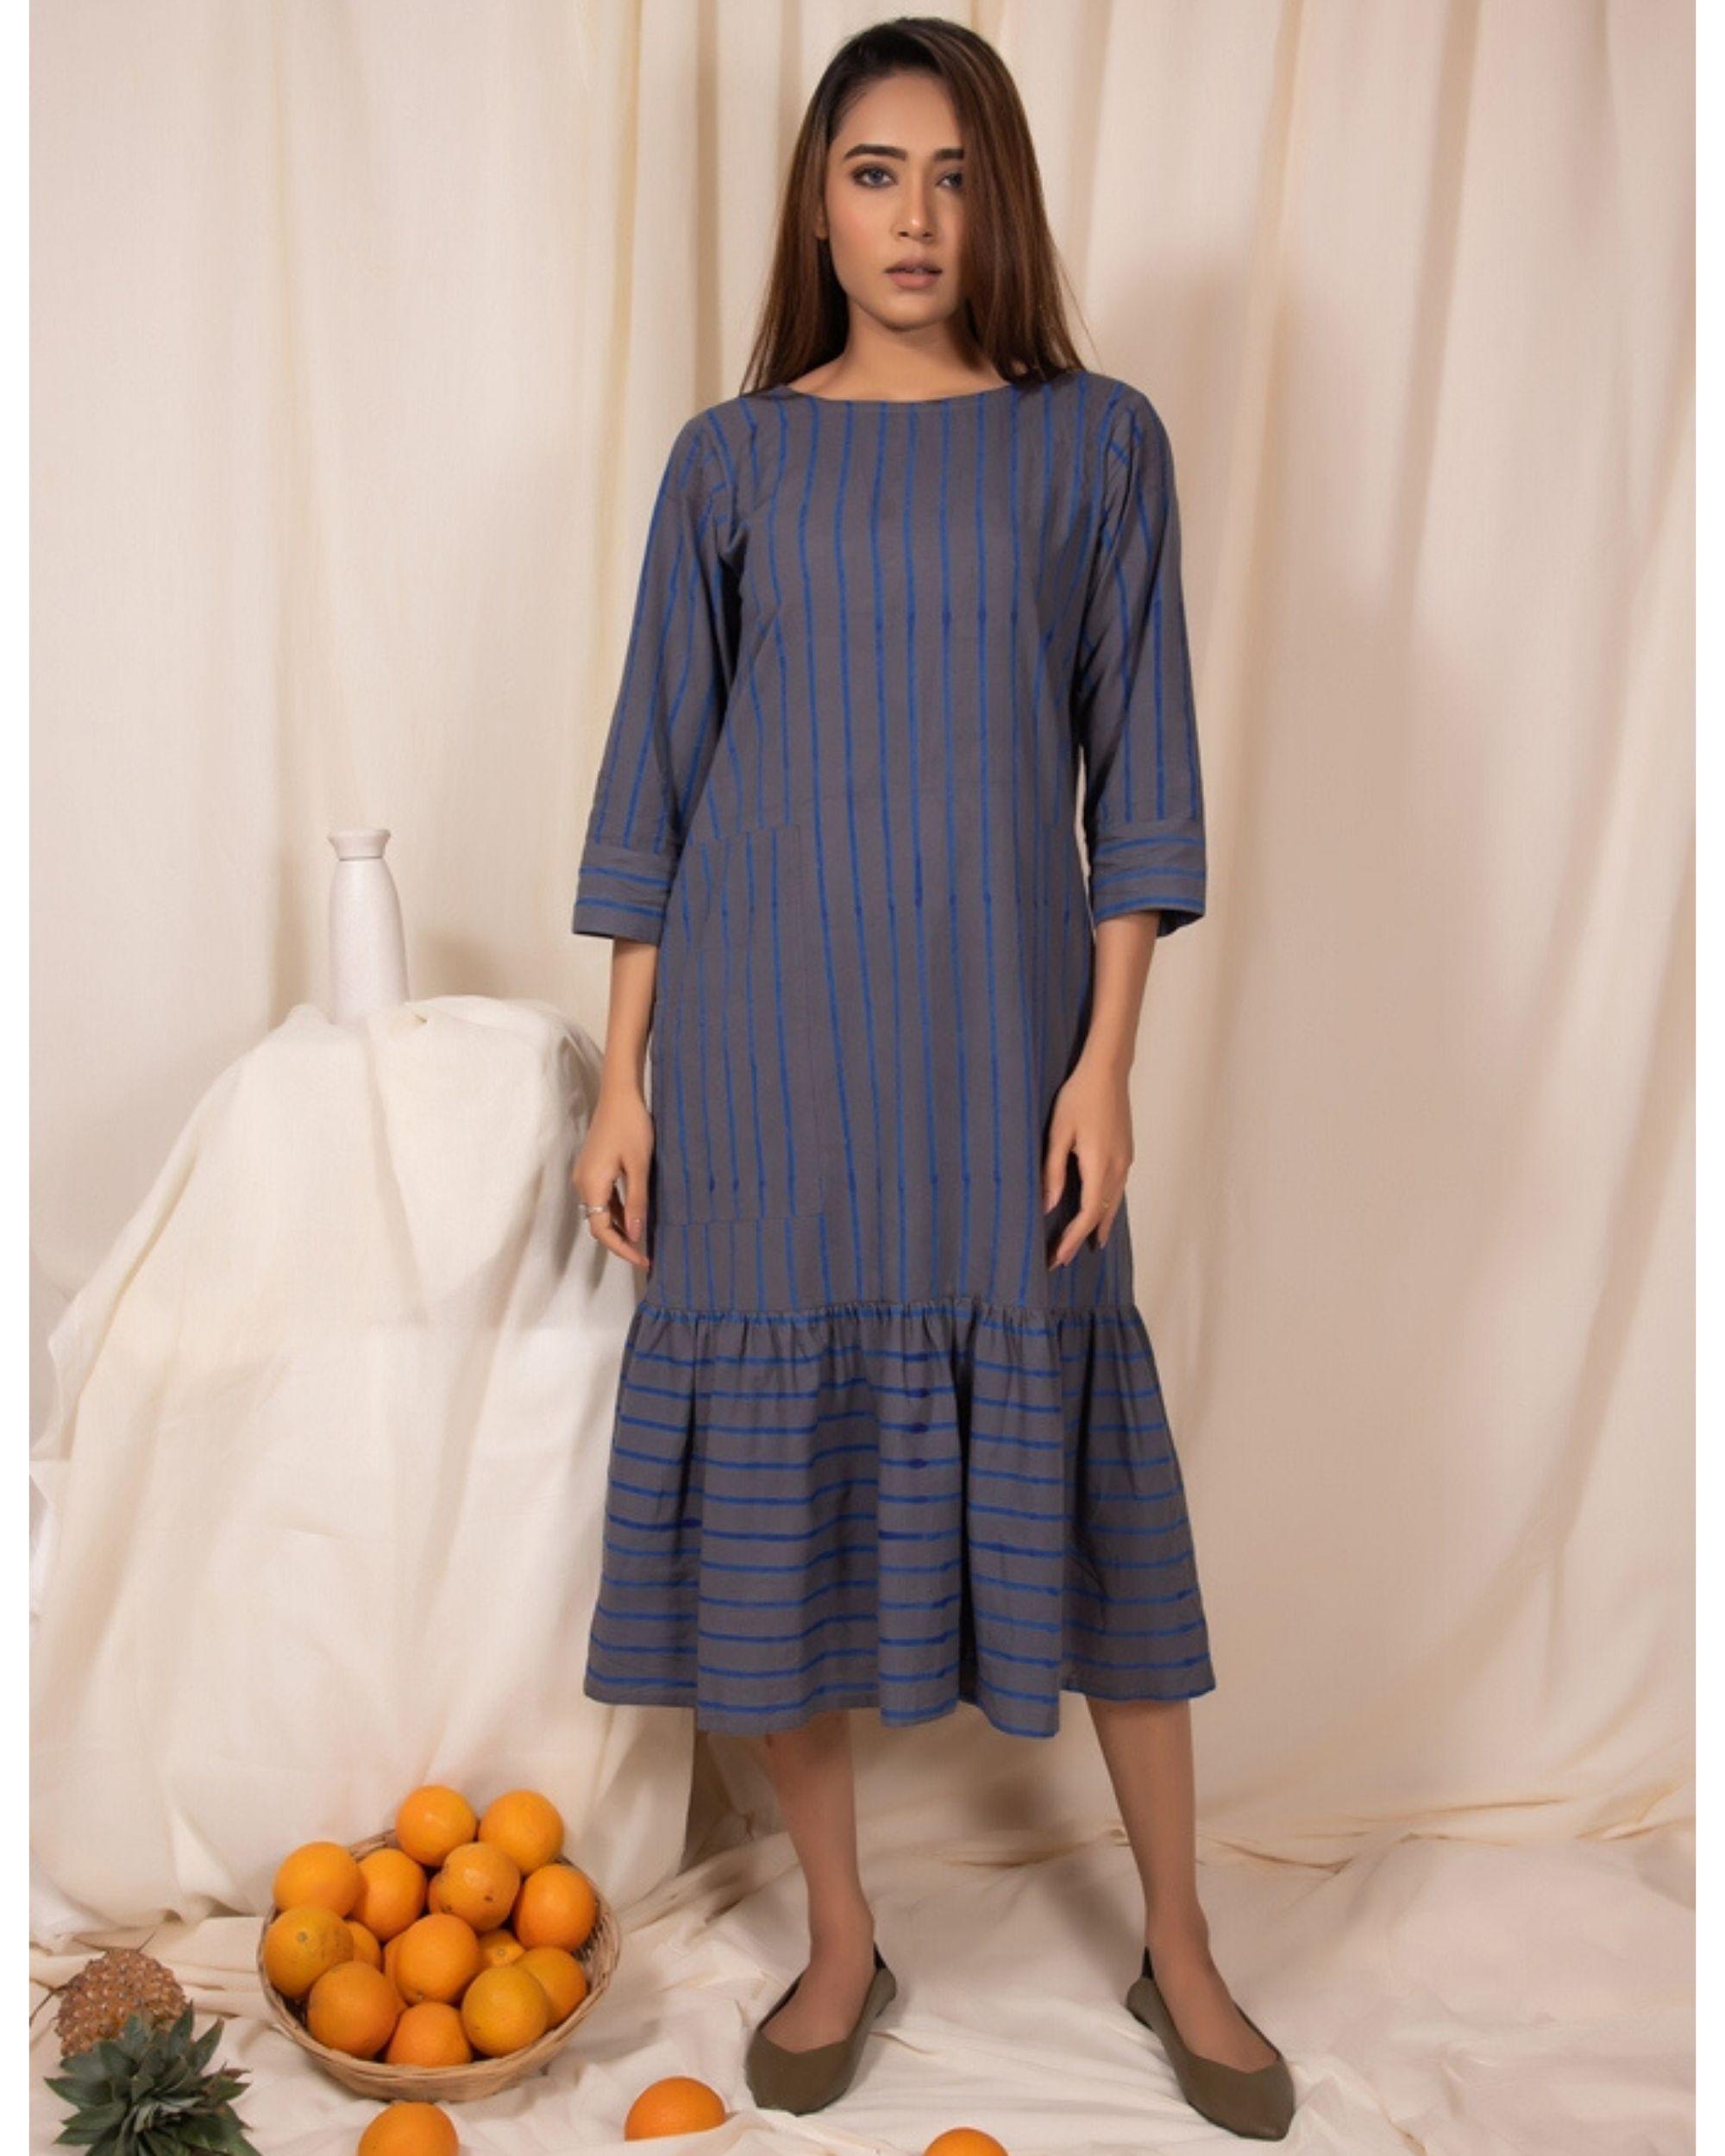 Bluish grey striped dress with gathers